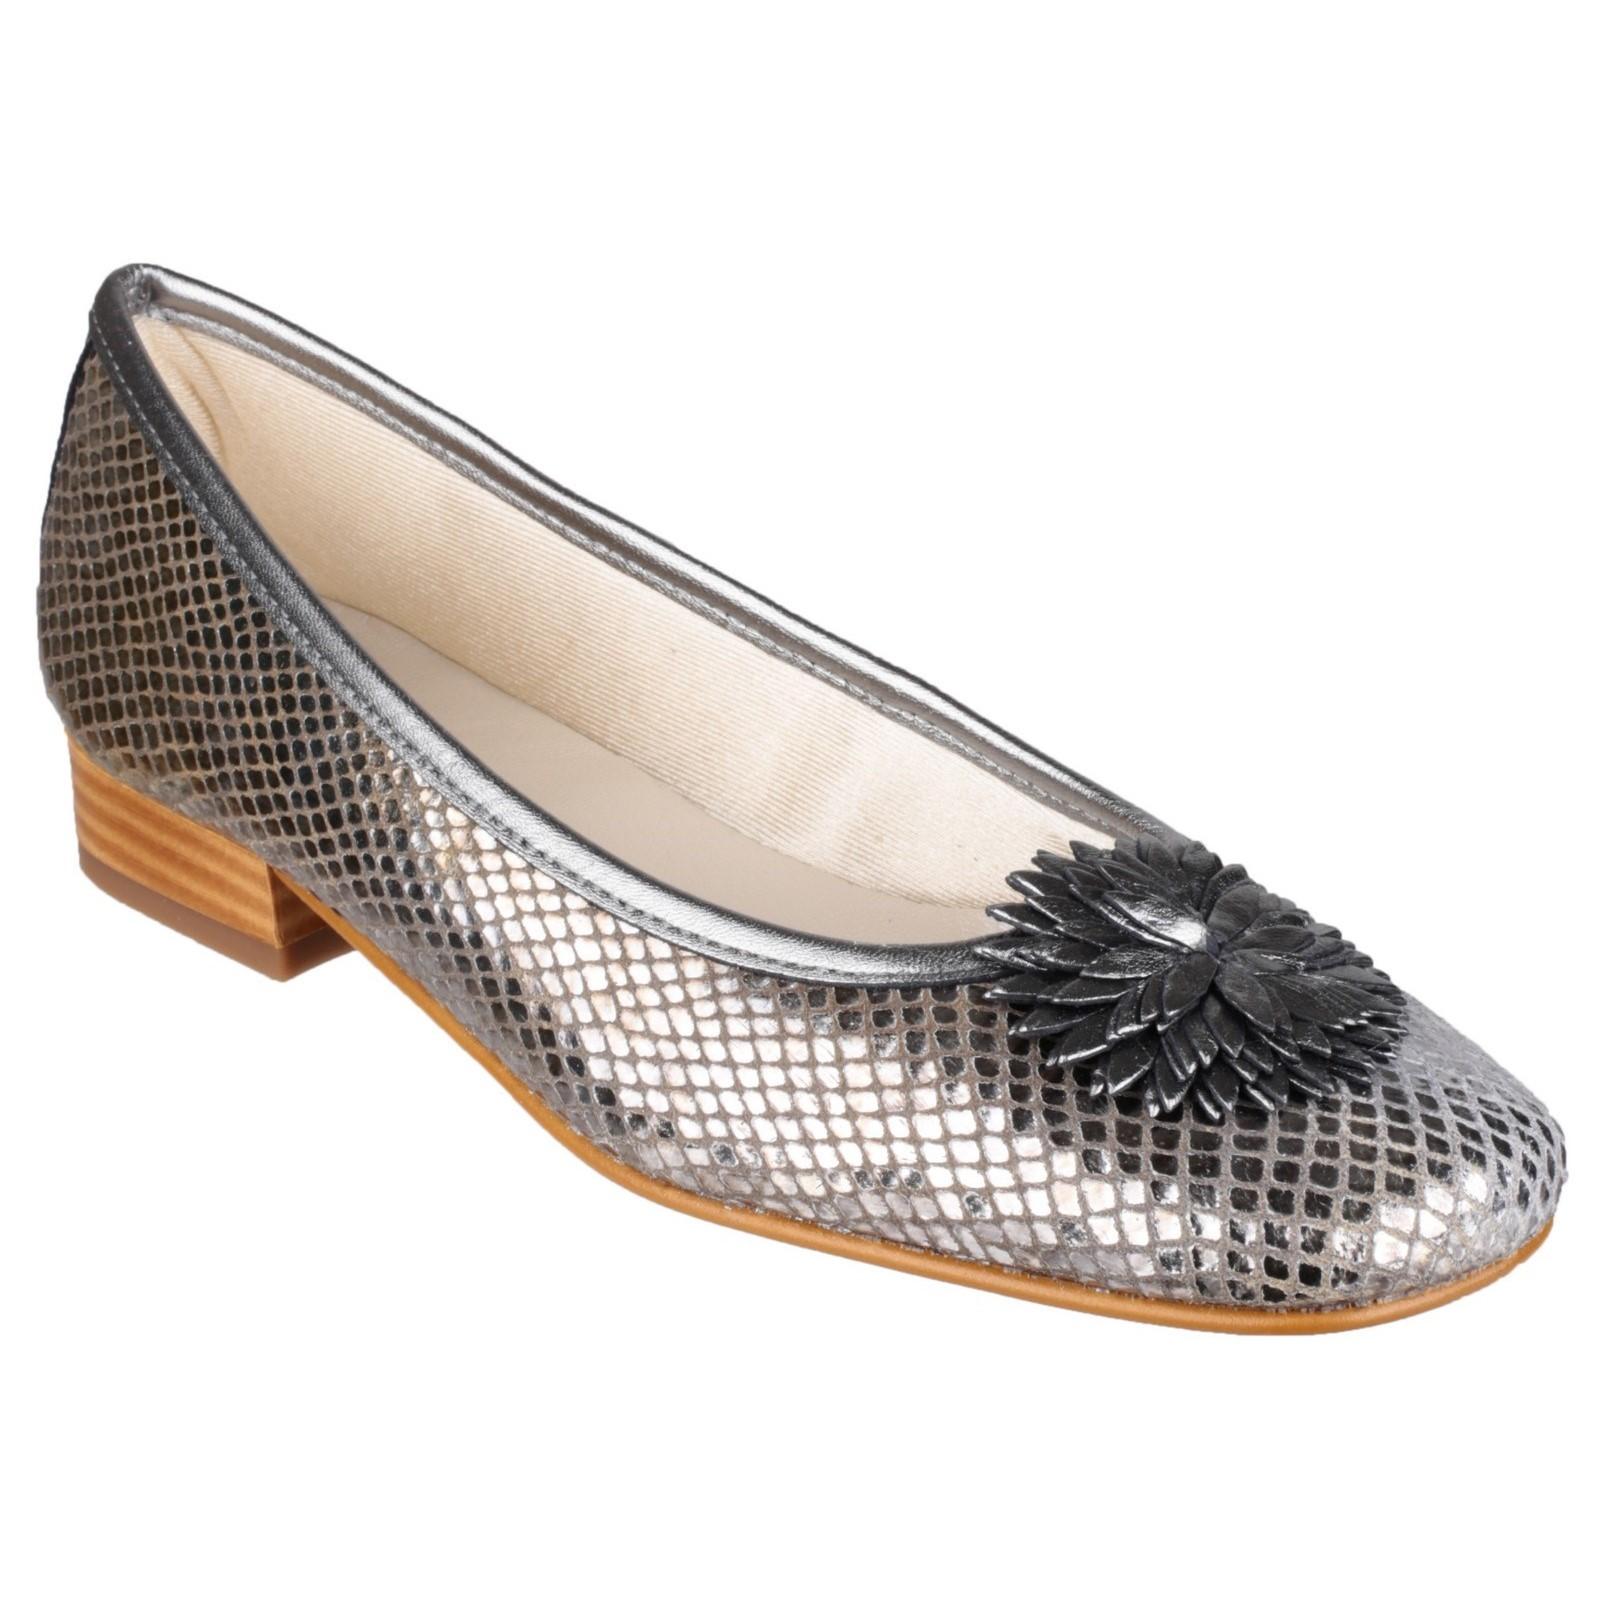 Riva femme la plaque Ballerine Chaussures Femmes Pewter Taille UK 7 EU 40